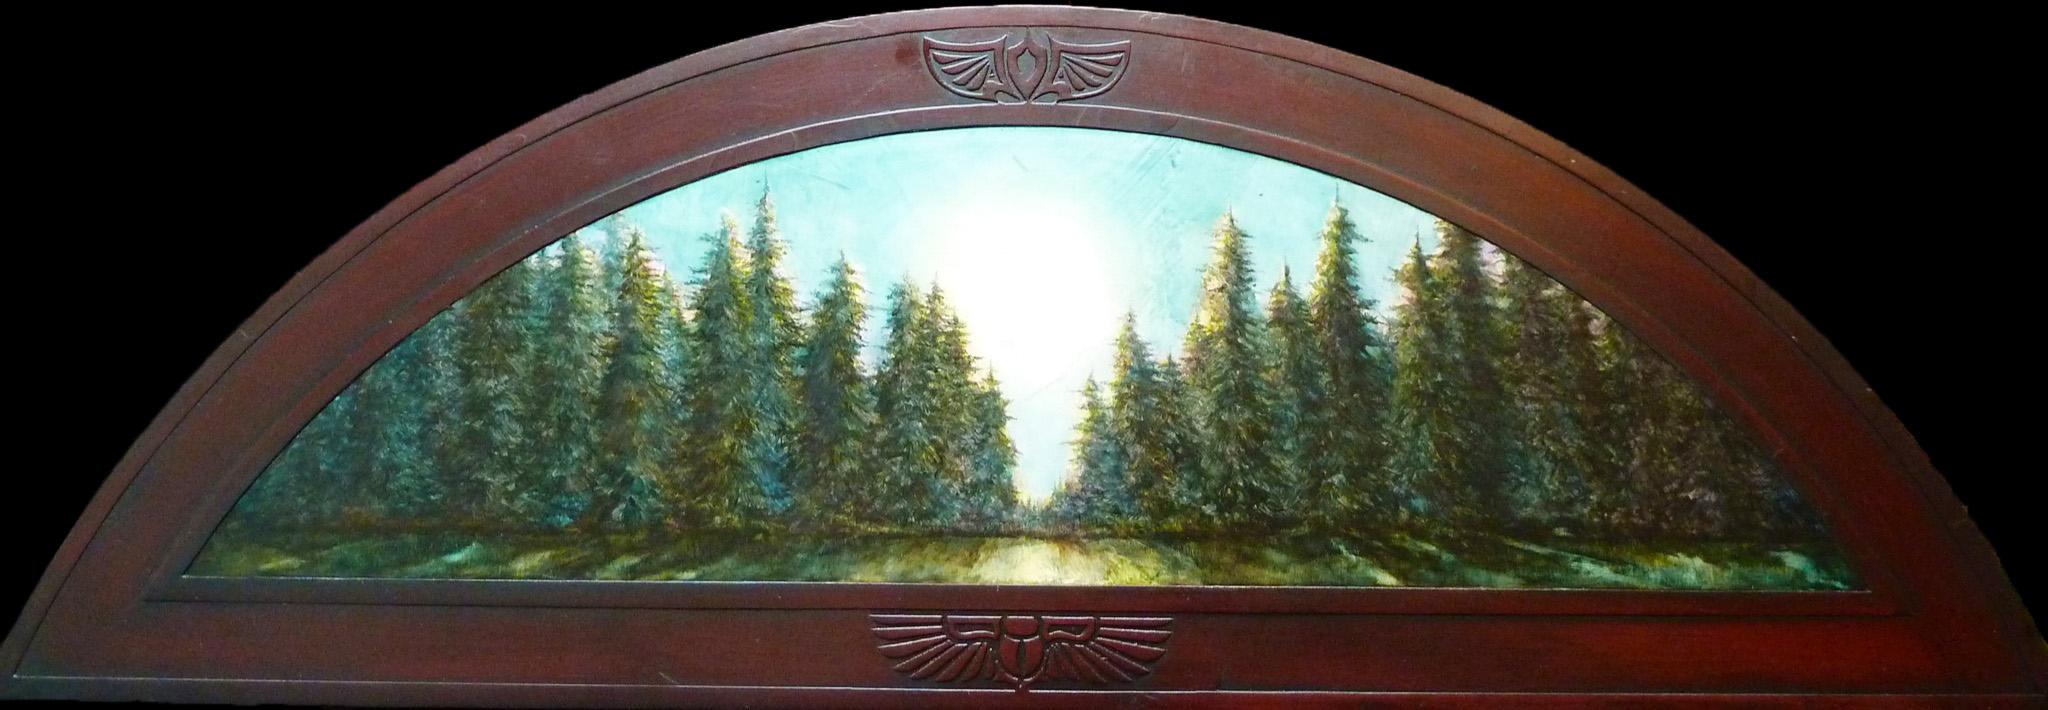 Pine Trees in Moonlight - $1,200